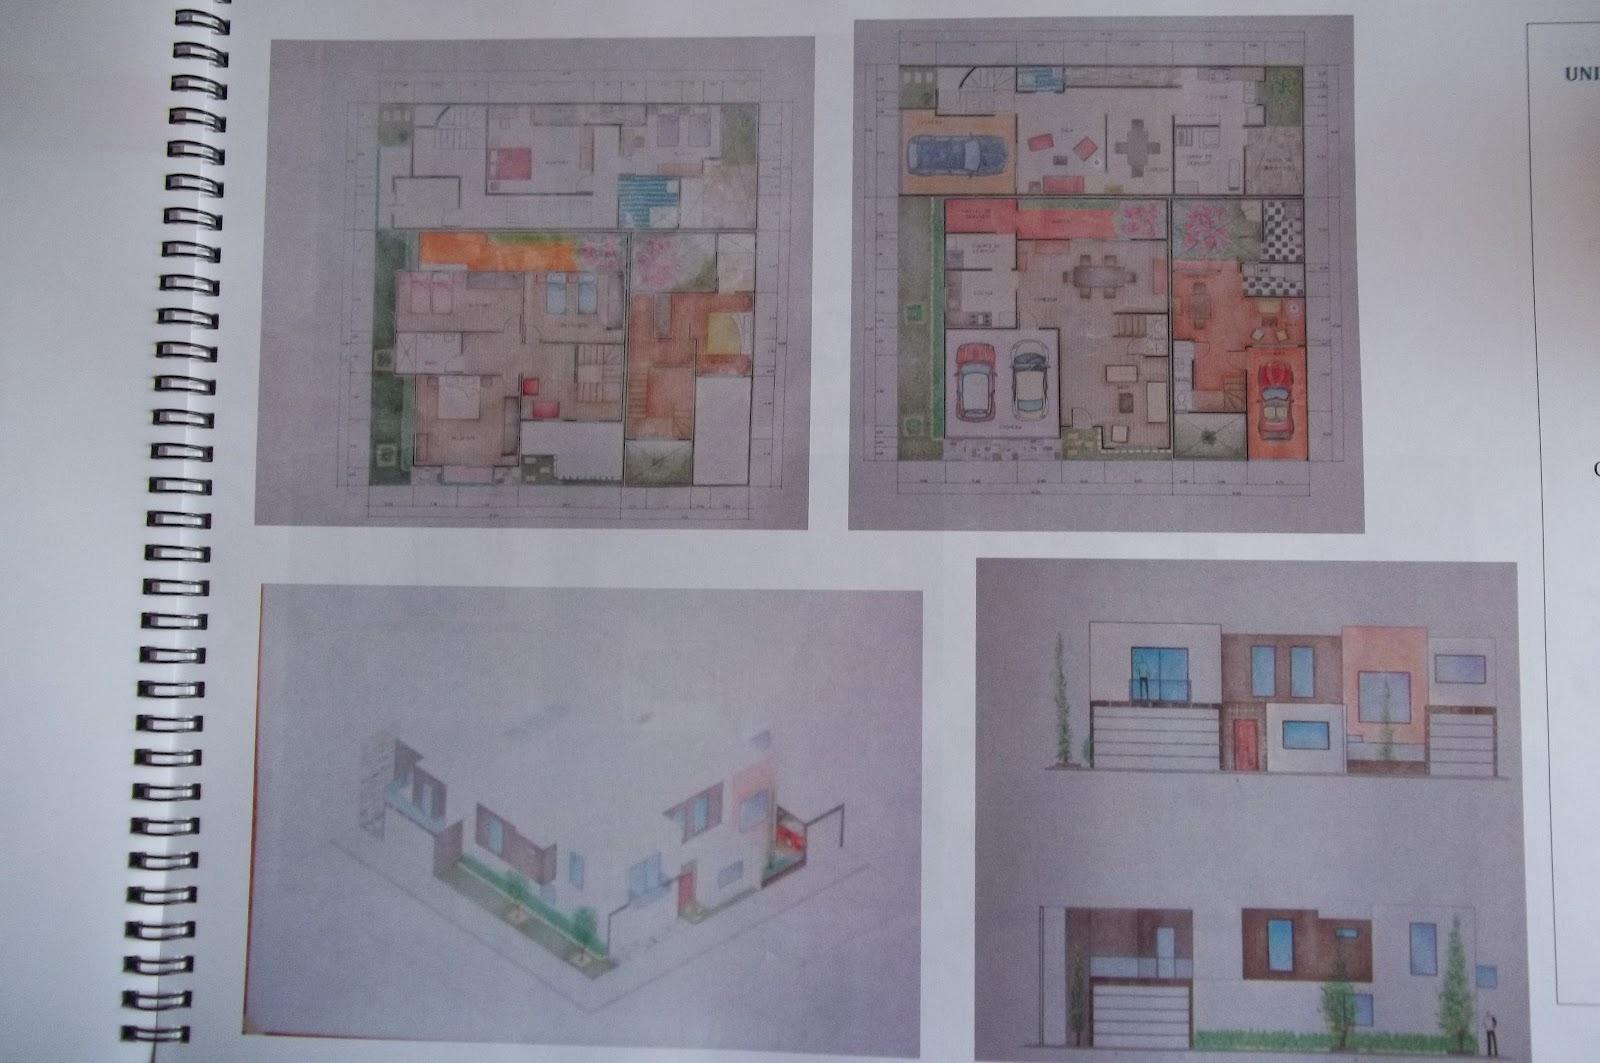 Arquitectura for Proyecto casa habitacion minimalista